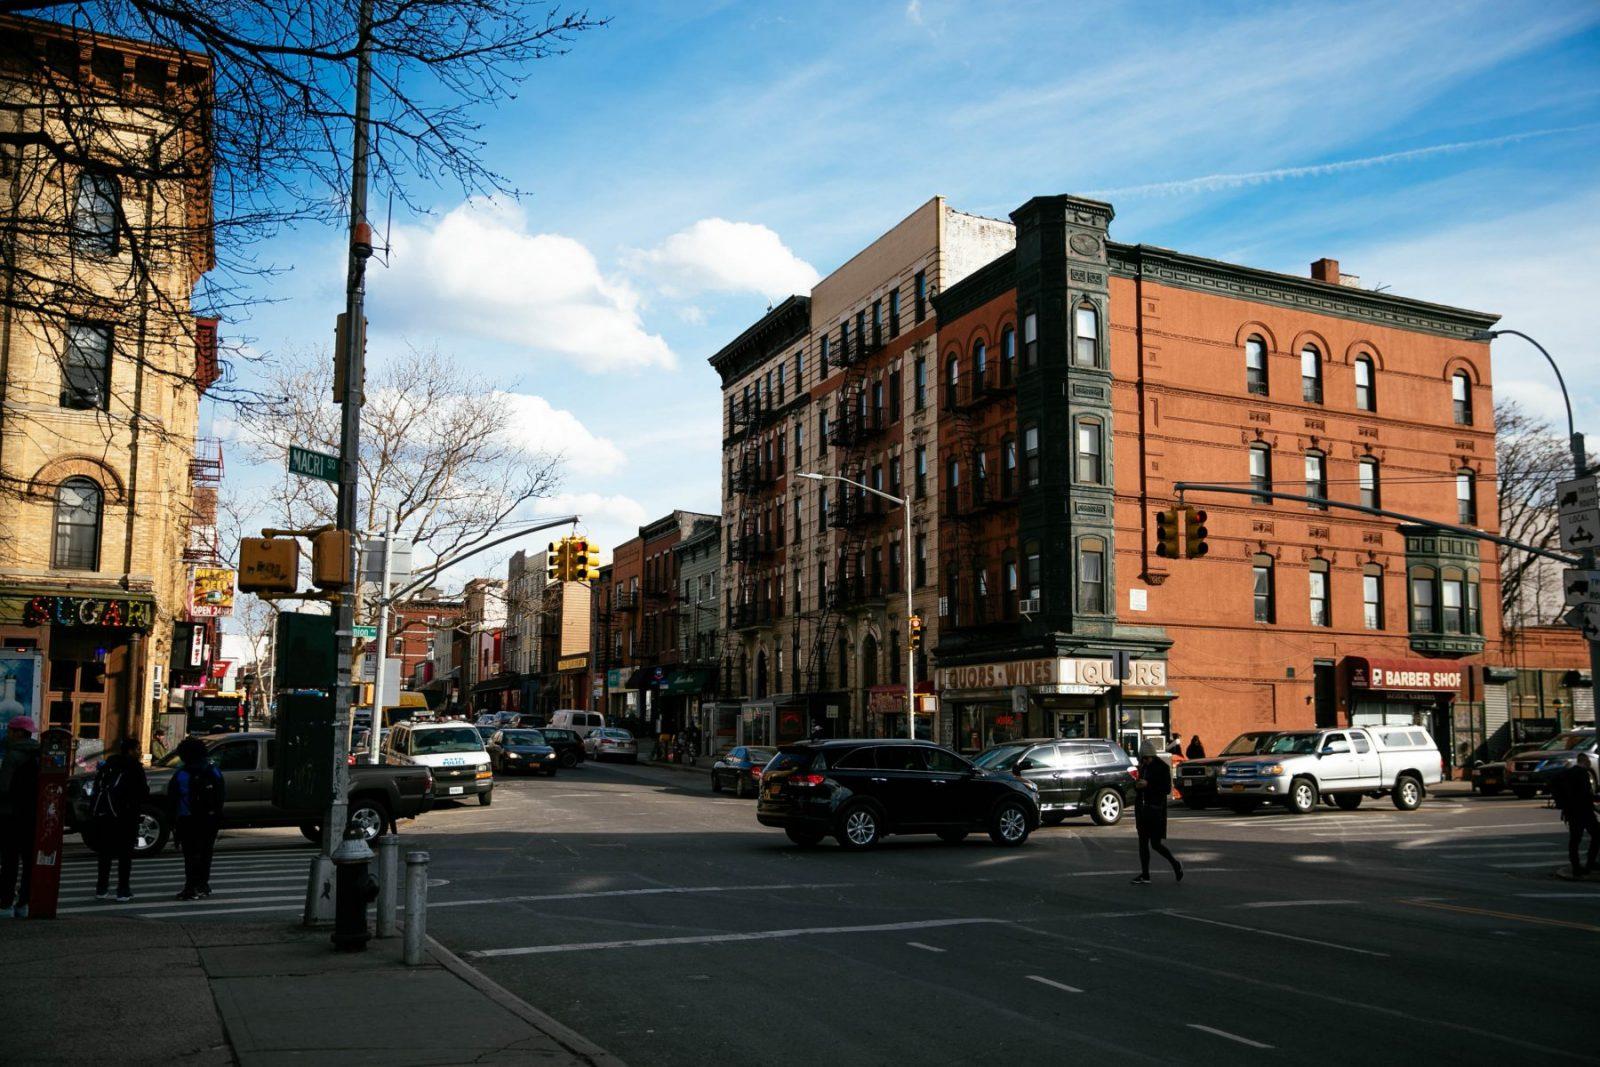 Williamsburg_NYC_Hotspots_Mattgstyle_2